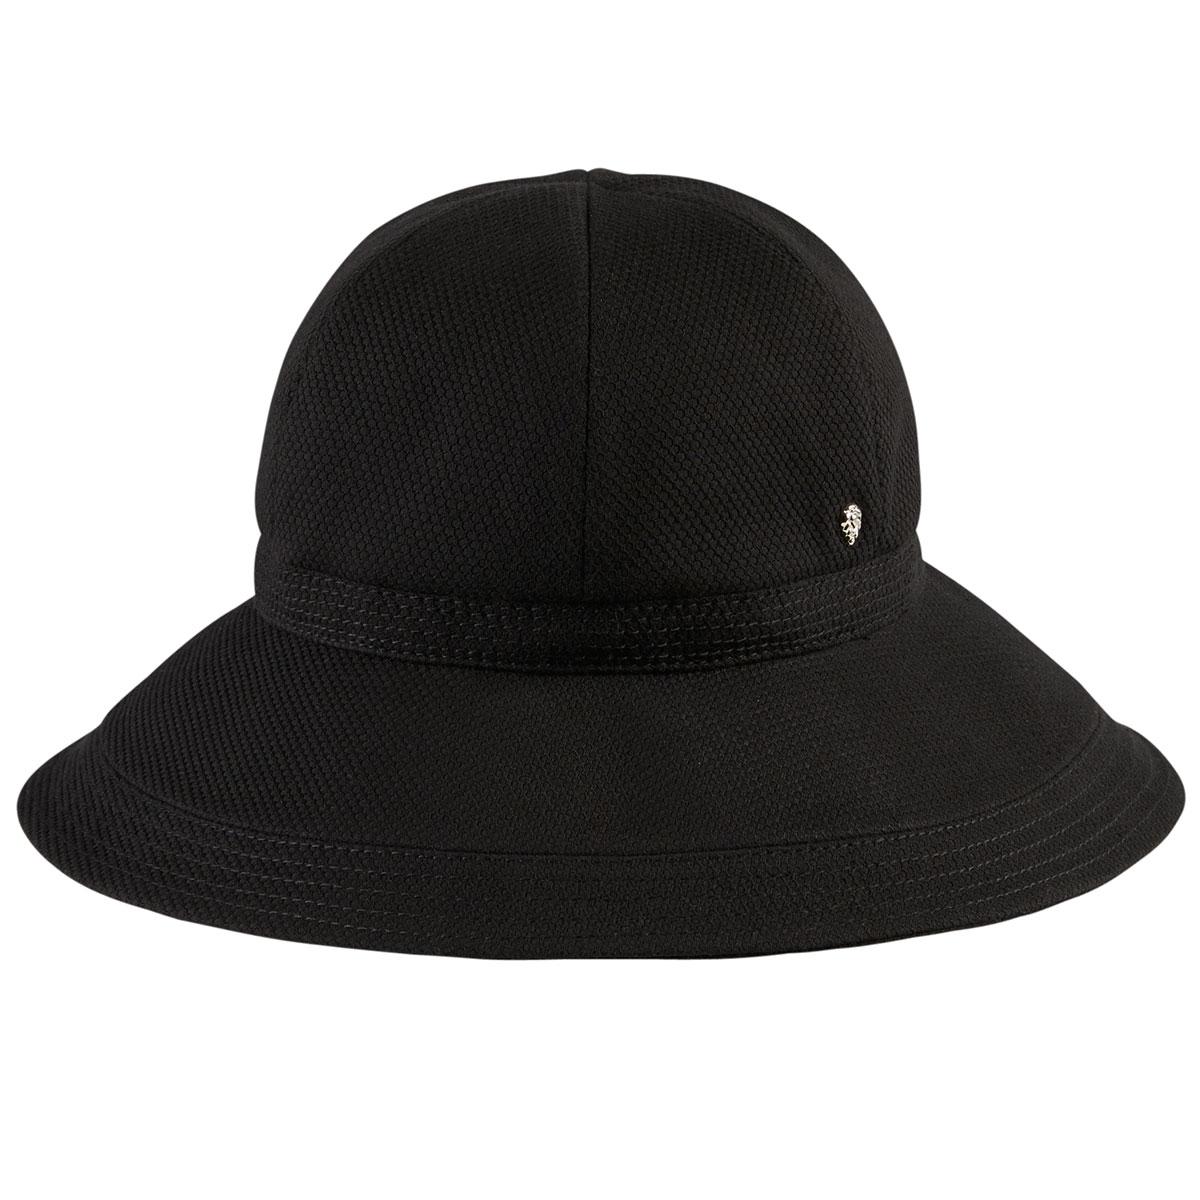 Danique Wide Brim - Black/1SFM